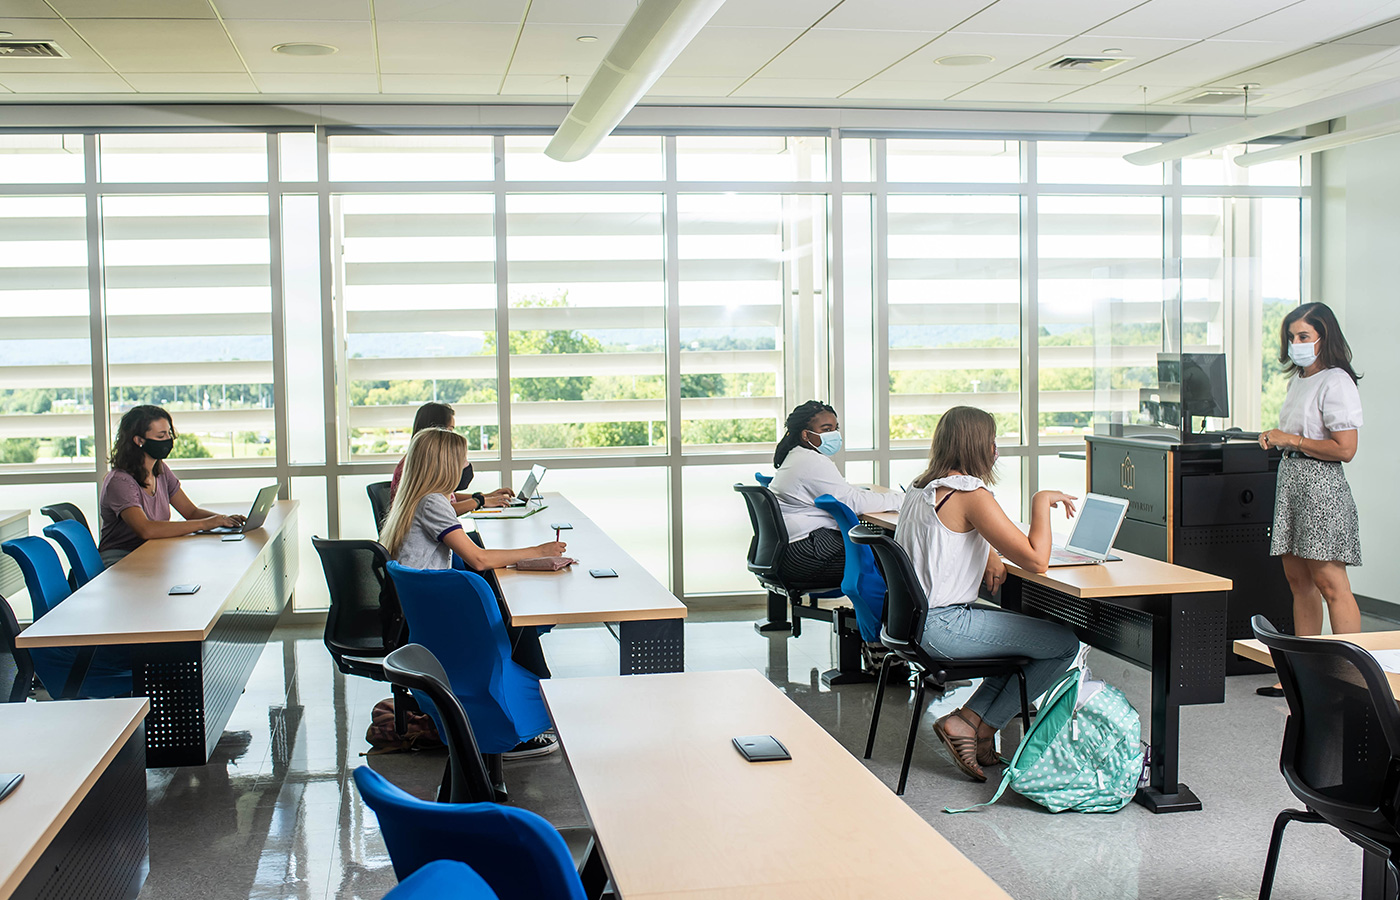 DeSales University Classroom